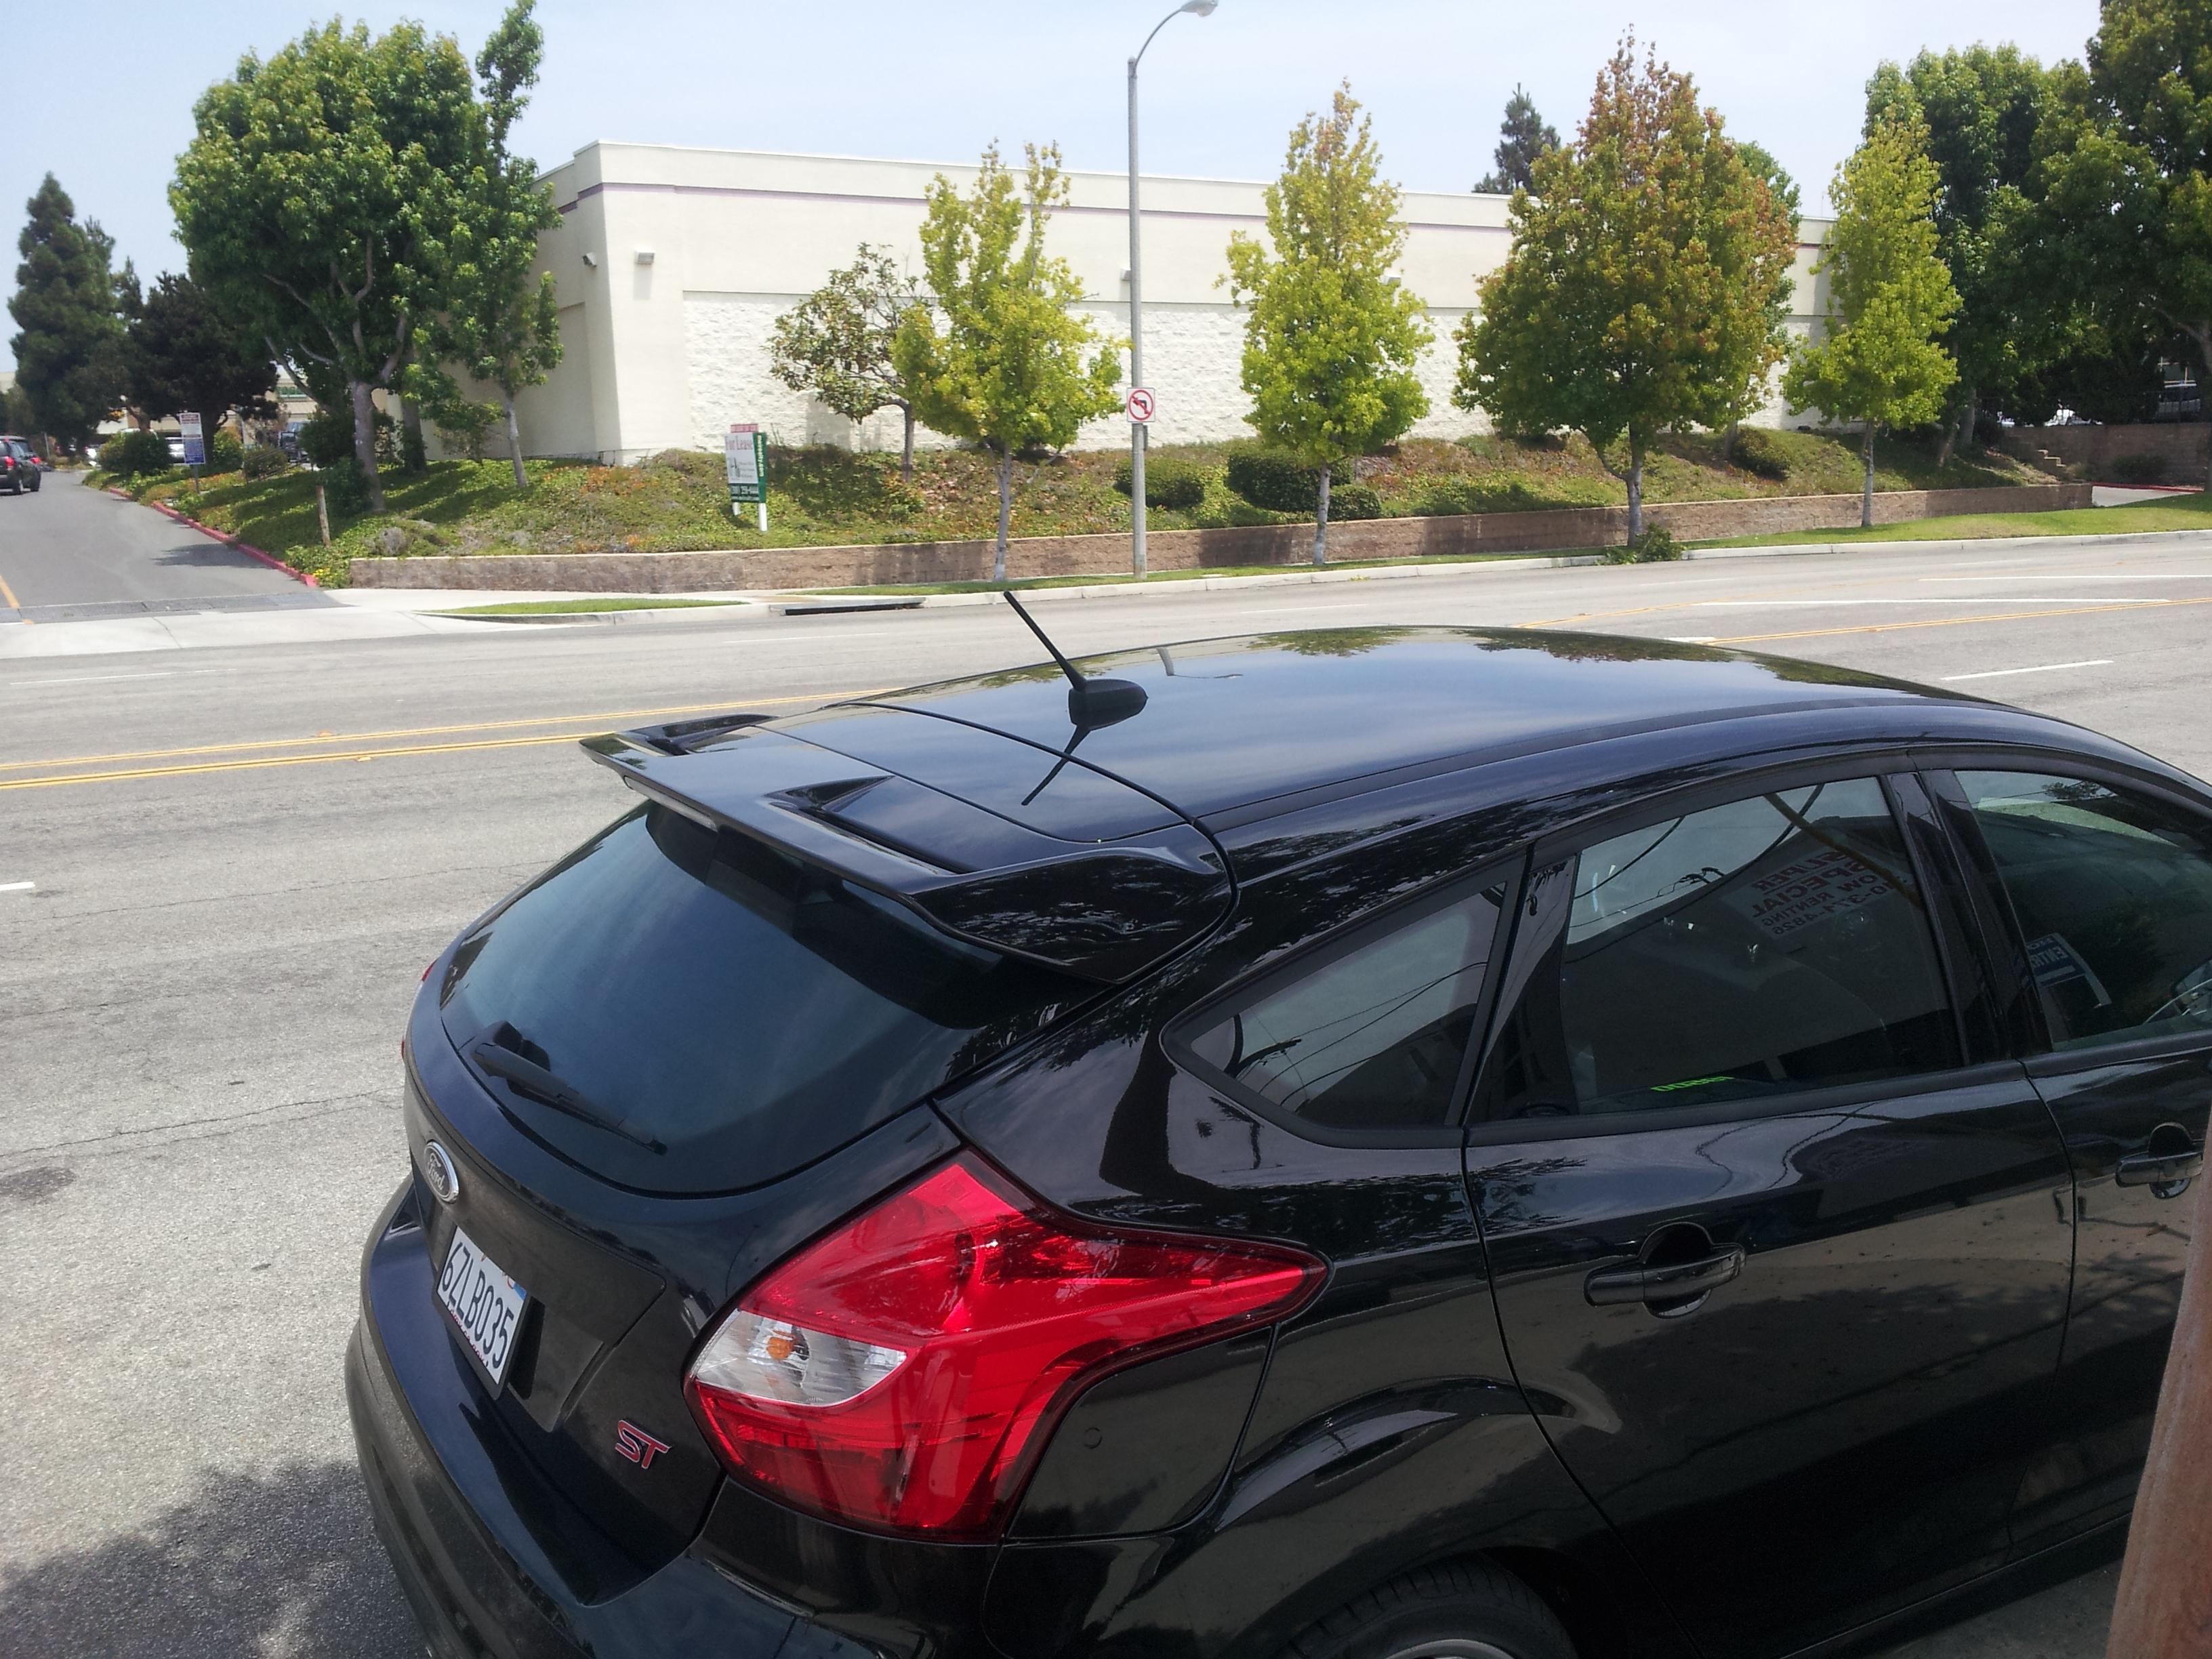 Antenna Replacement: '12 Honda CRV stubby antenna Never Before Seen